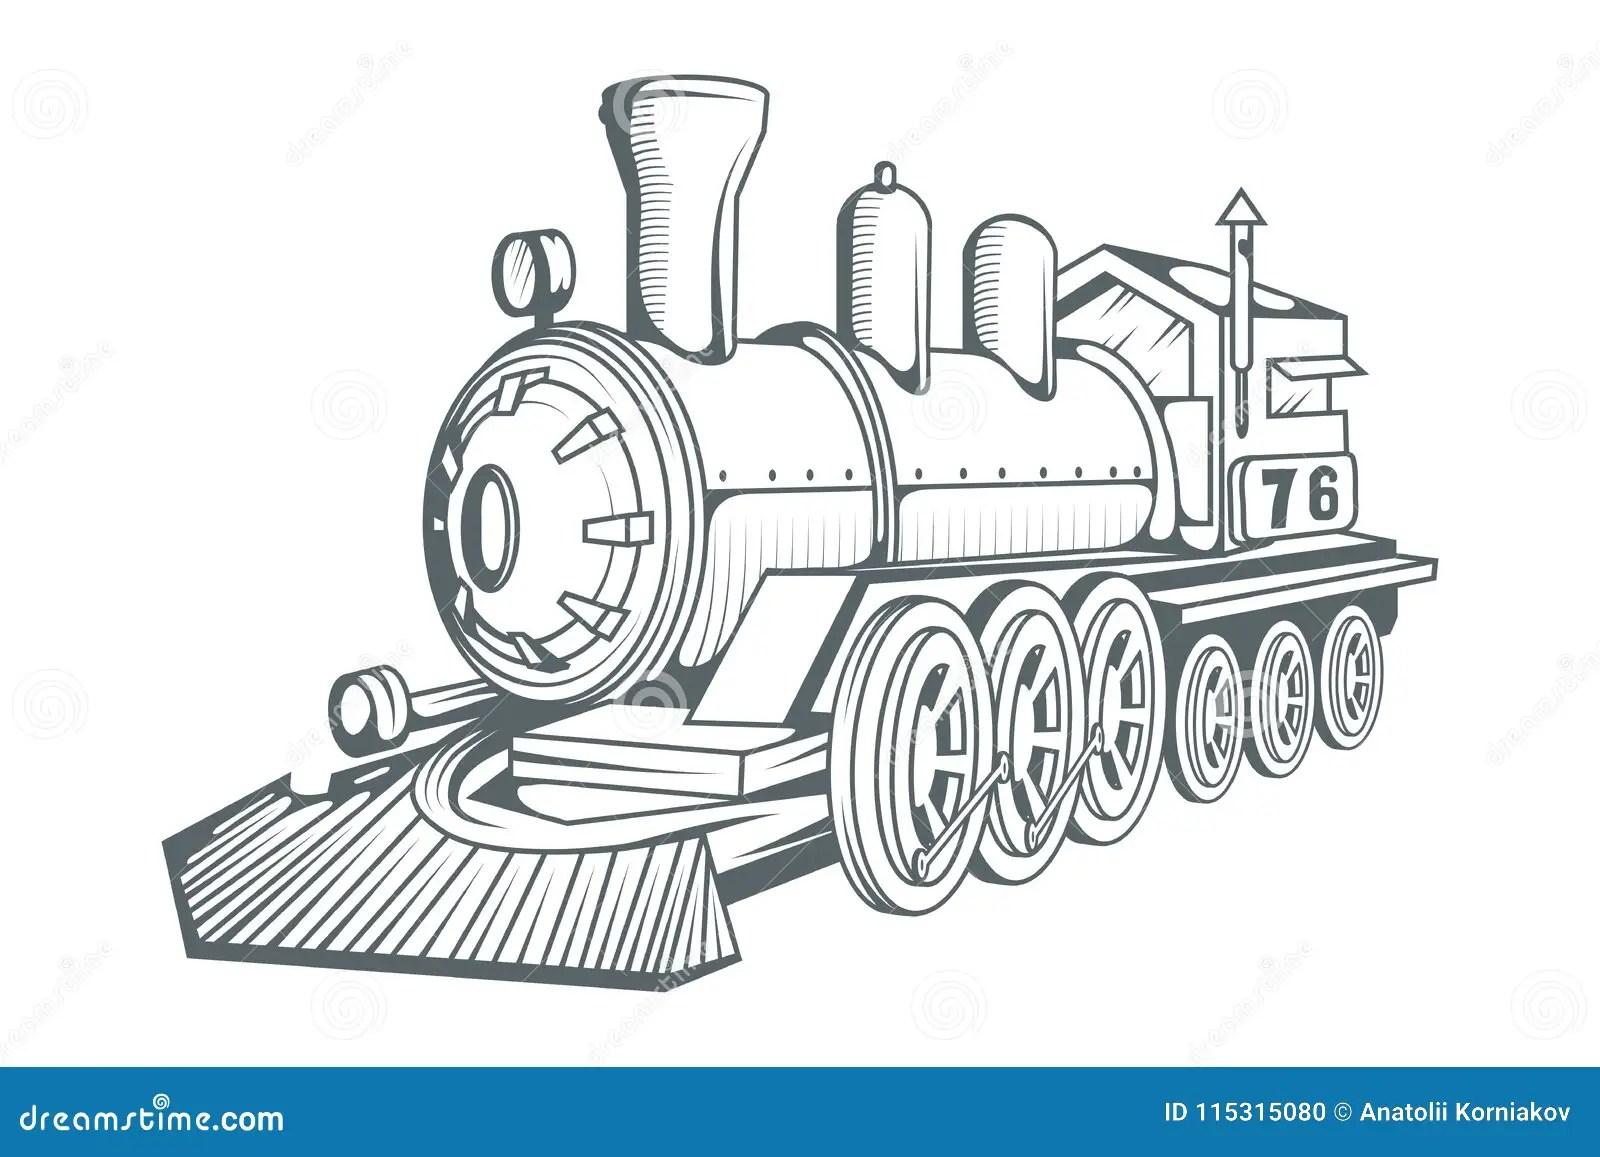 Vieux Logo De Train Dessin Locomotif Transport De Vapeur